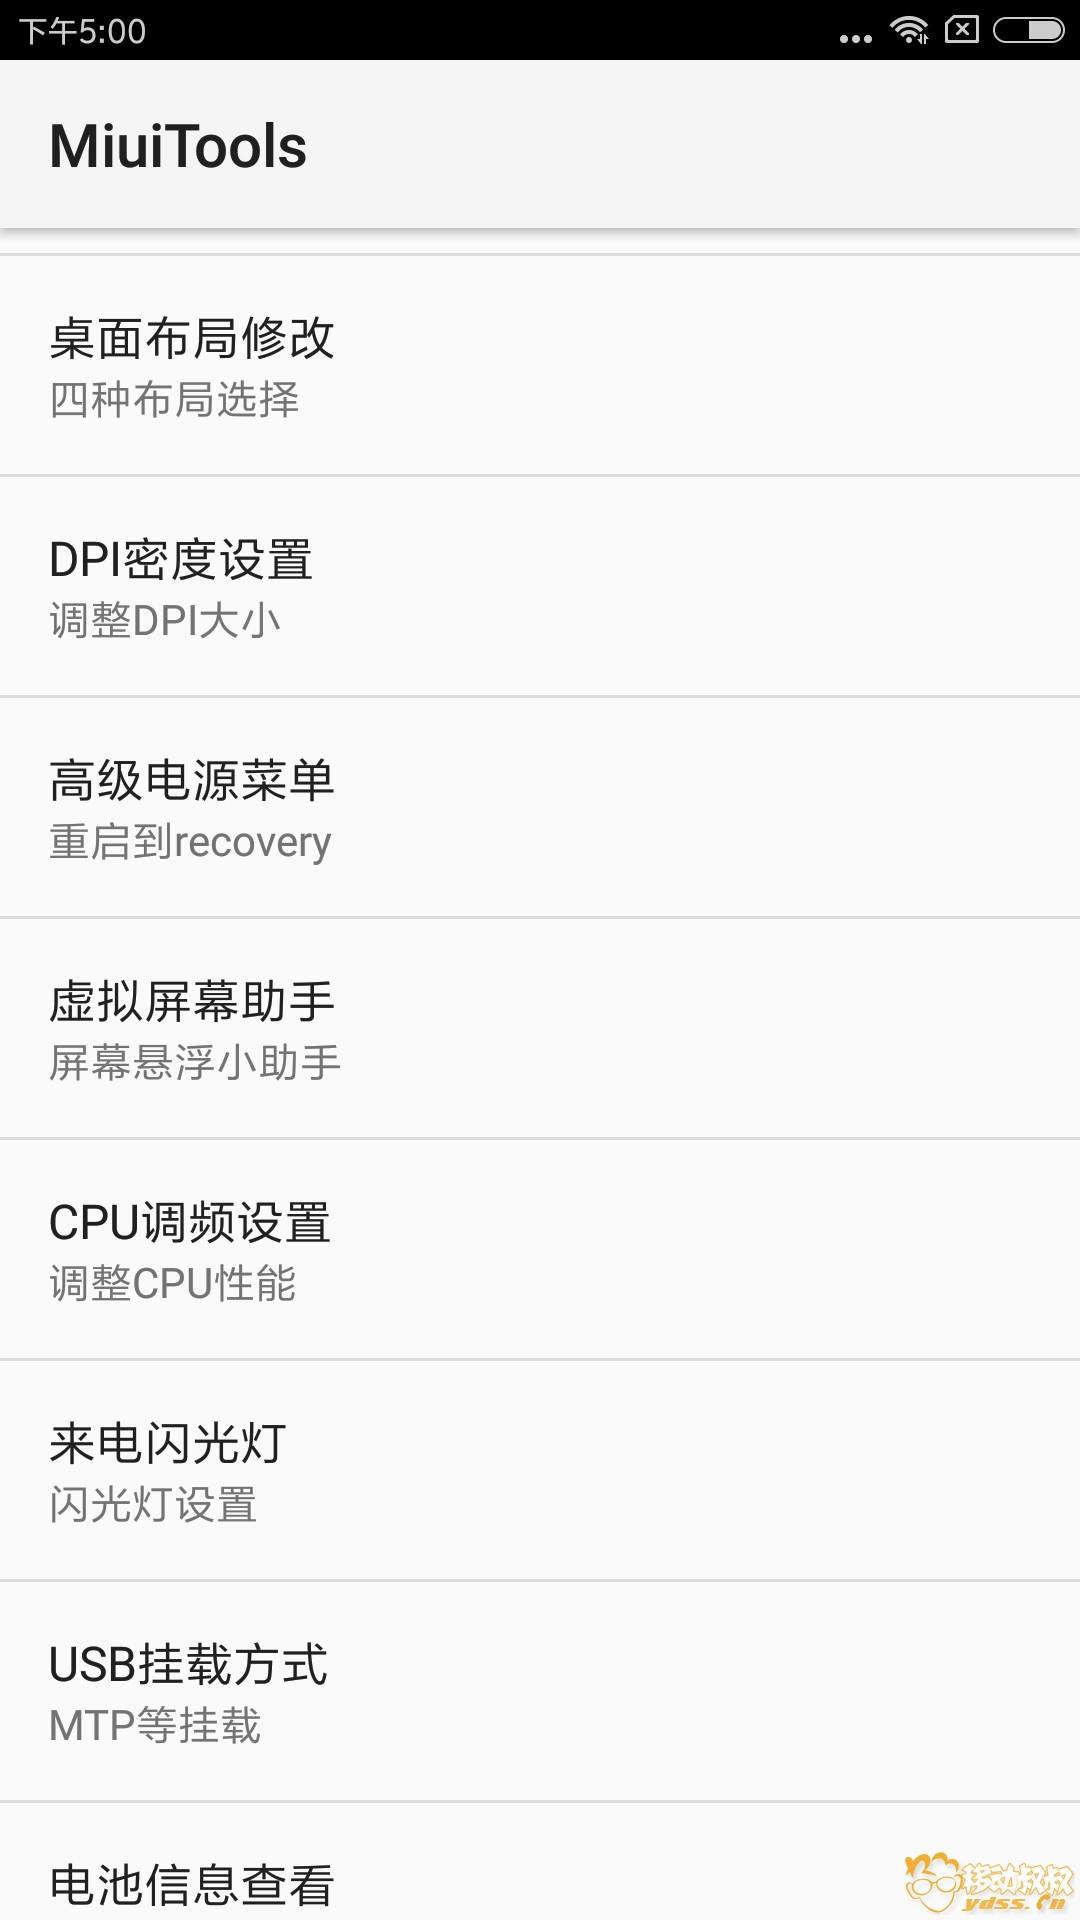 Screenshot_2018-07-12-17-00-37-873_com.anzhi.hwsettings.jpg